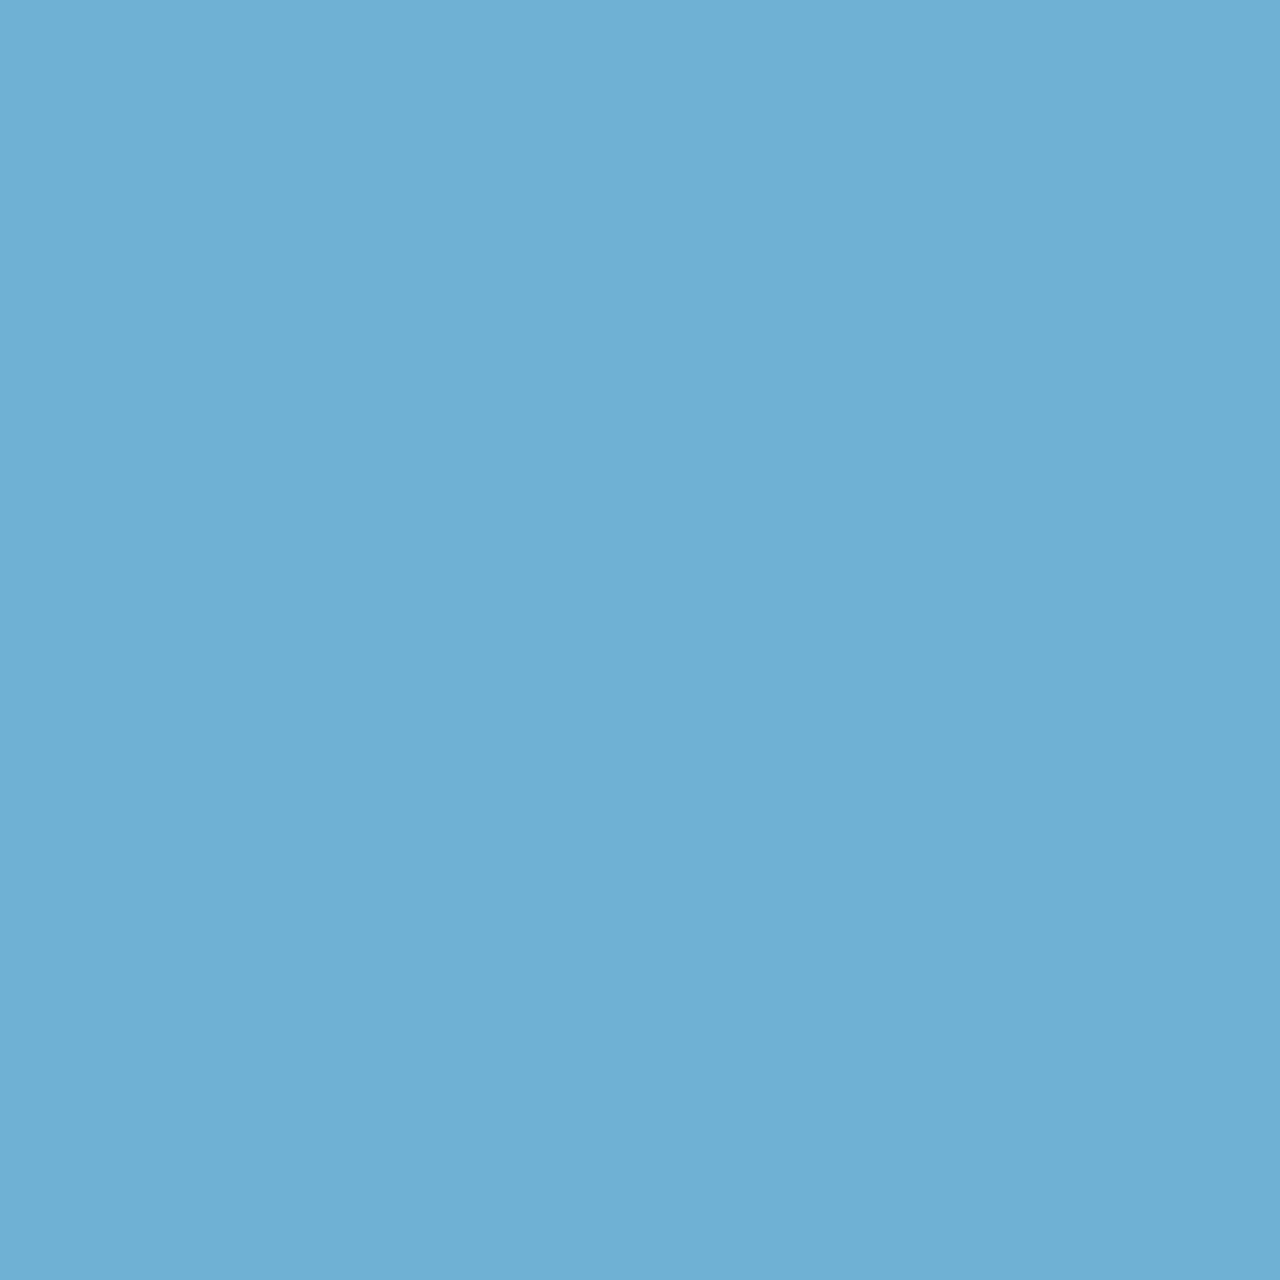 "#0060 Rosco Gels Roscolux No Color Blue, 20x24"""